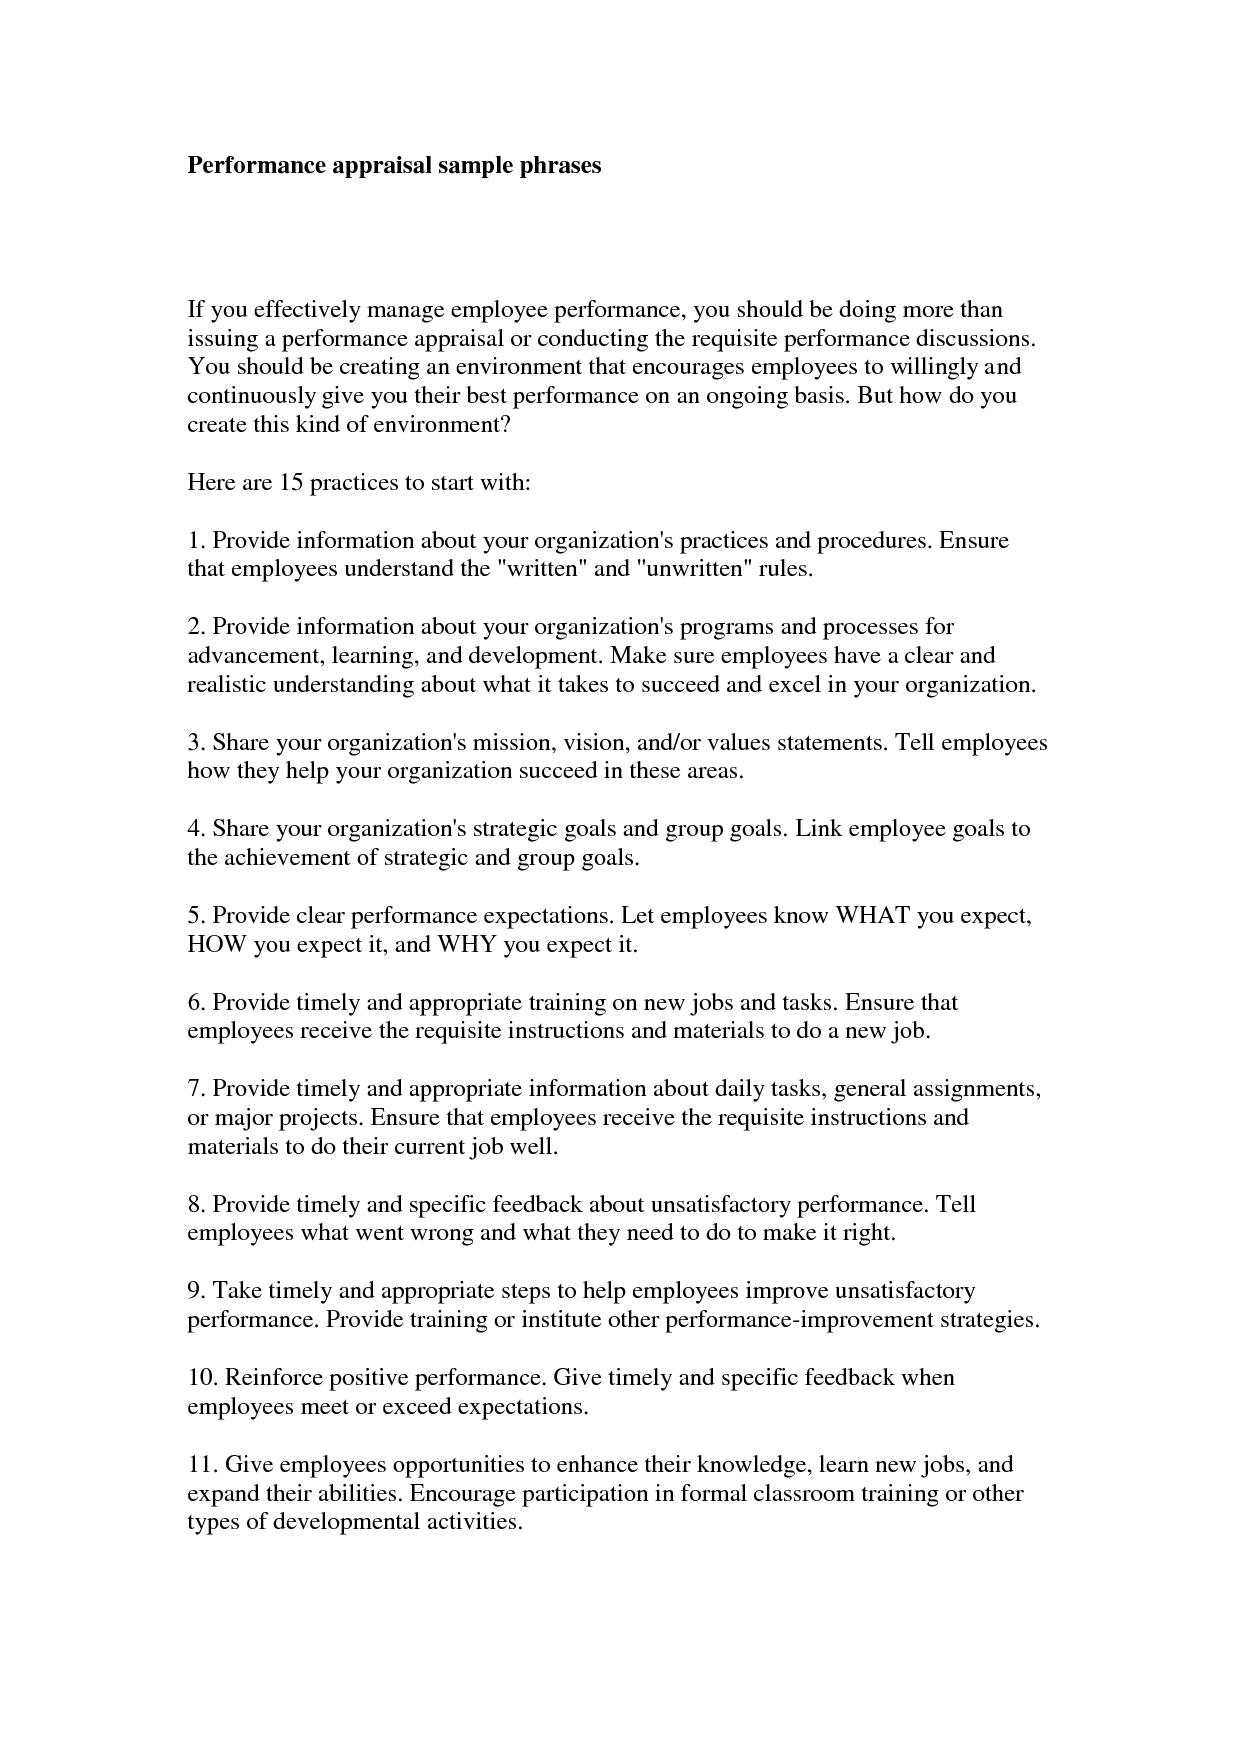 Sample receptionist performance appraisal.